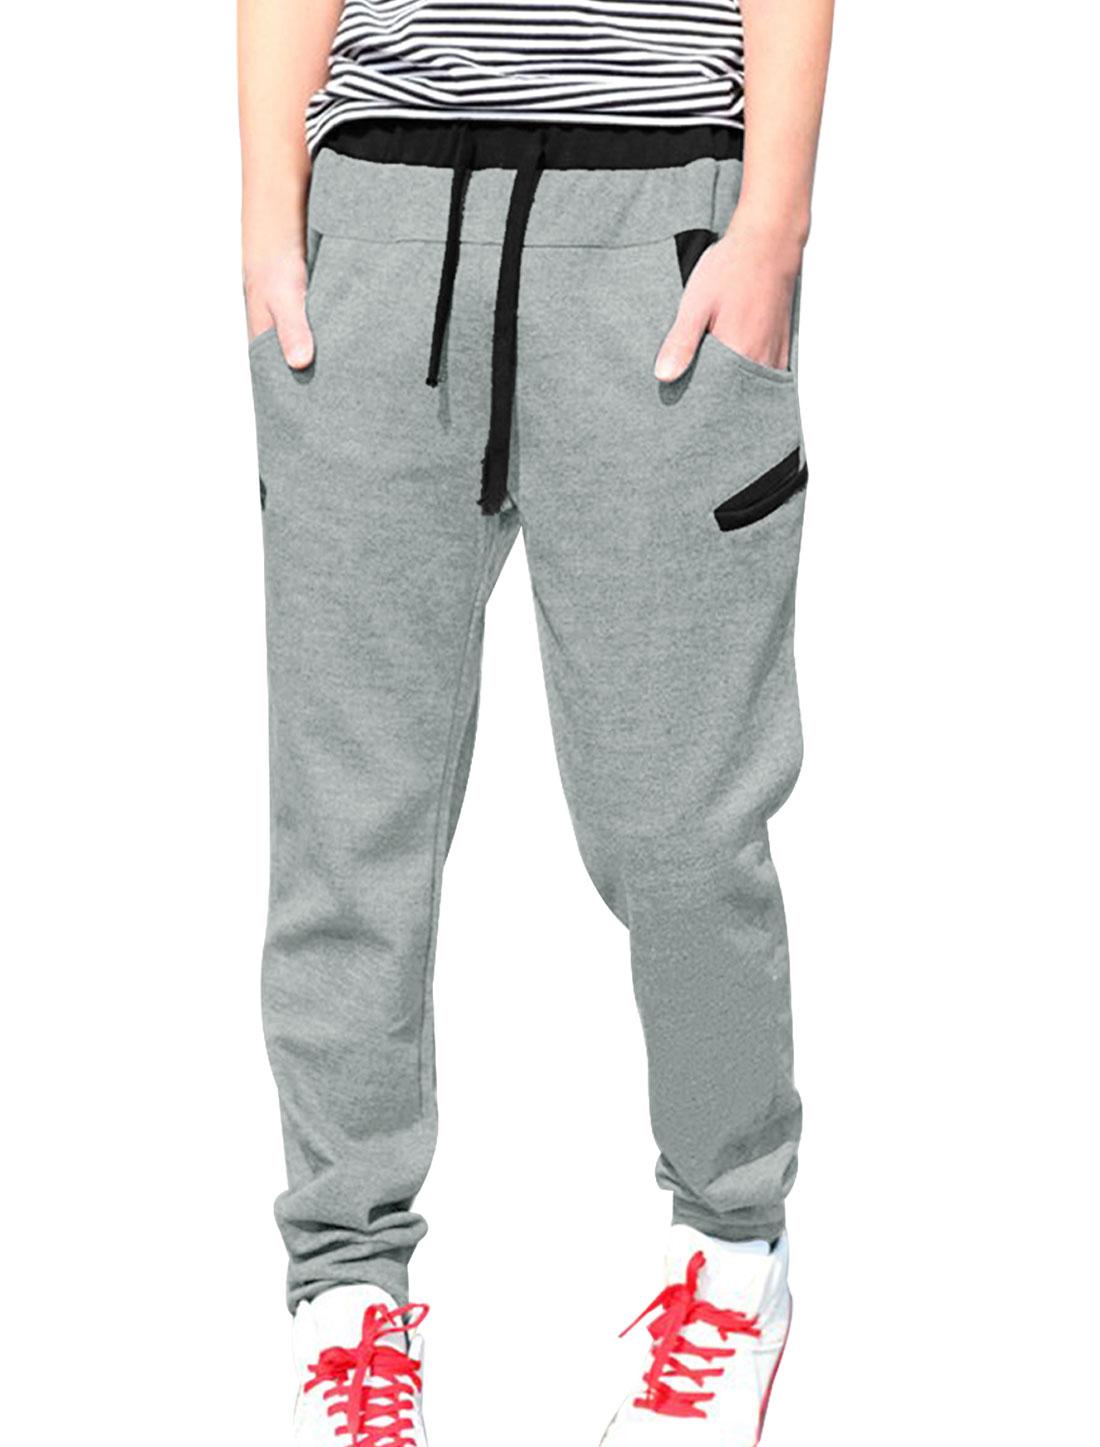 Men Stylish Elastic Waist Letter Print Back Sport Pants Light Gray W30